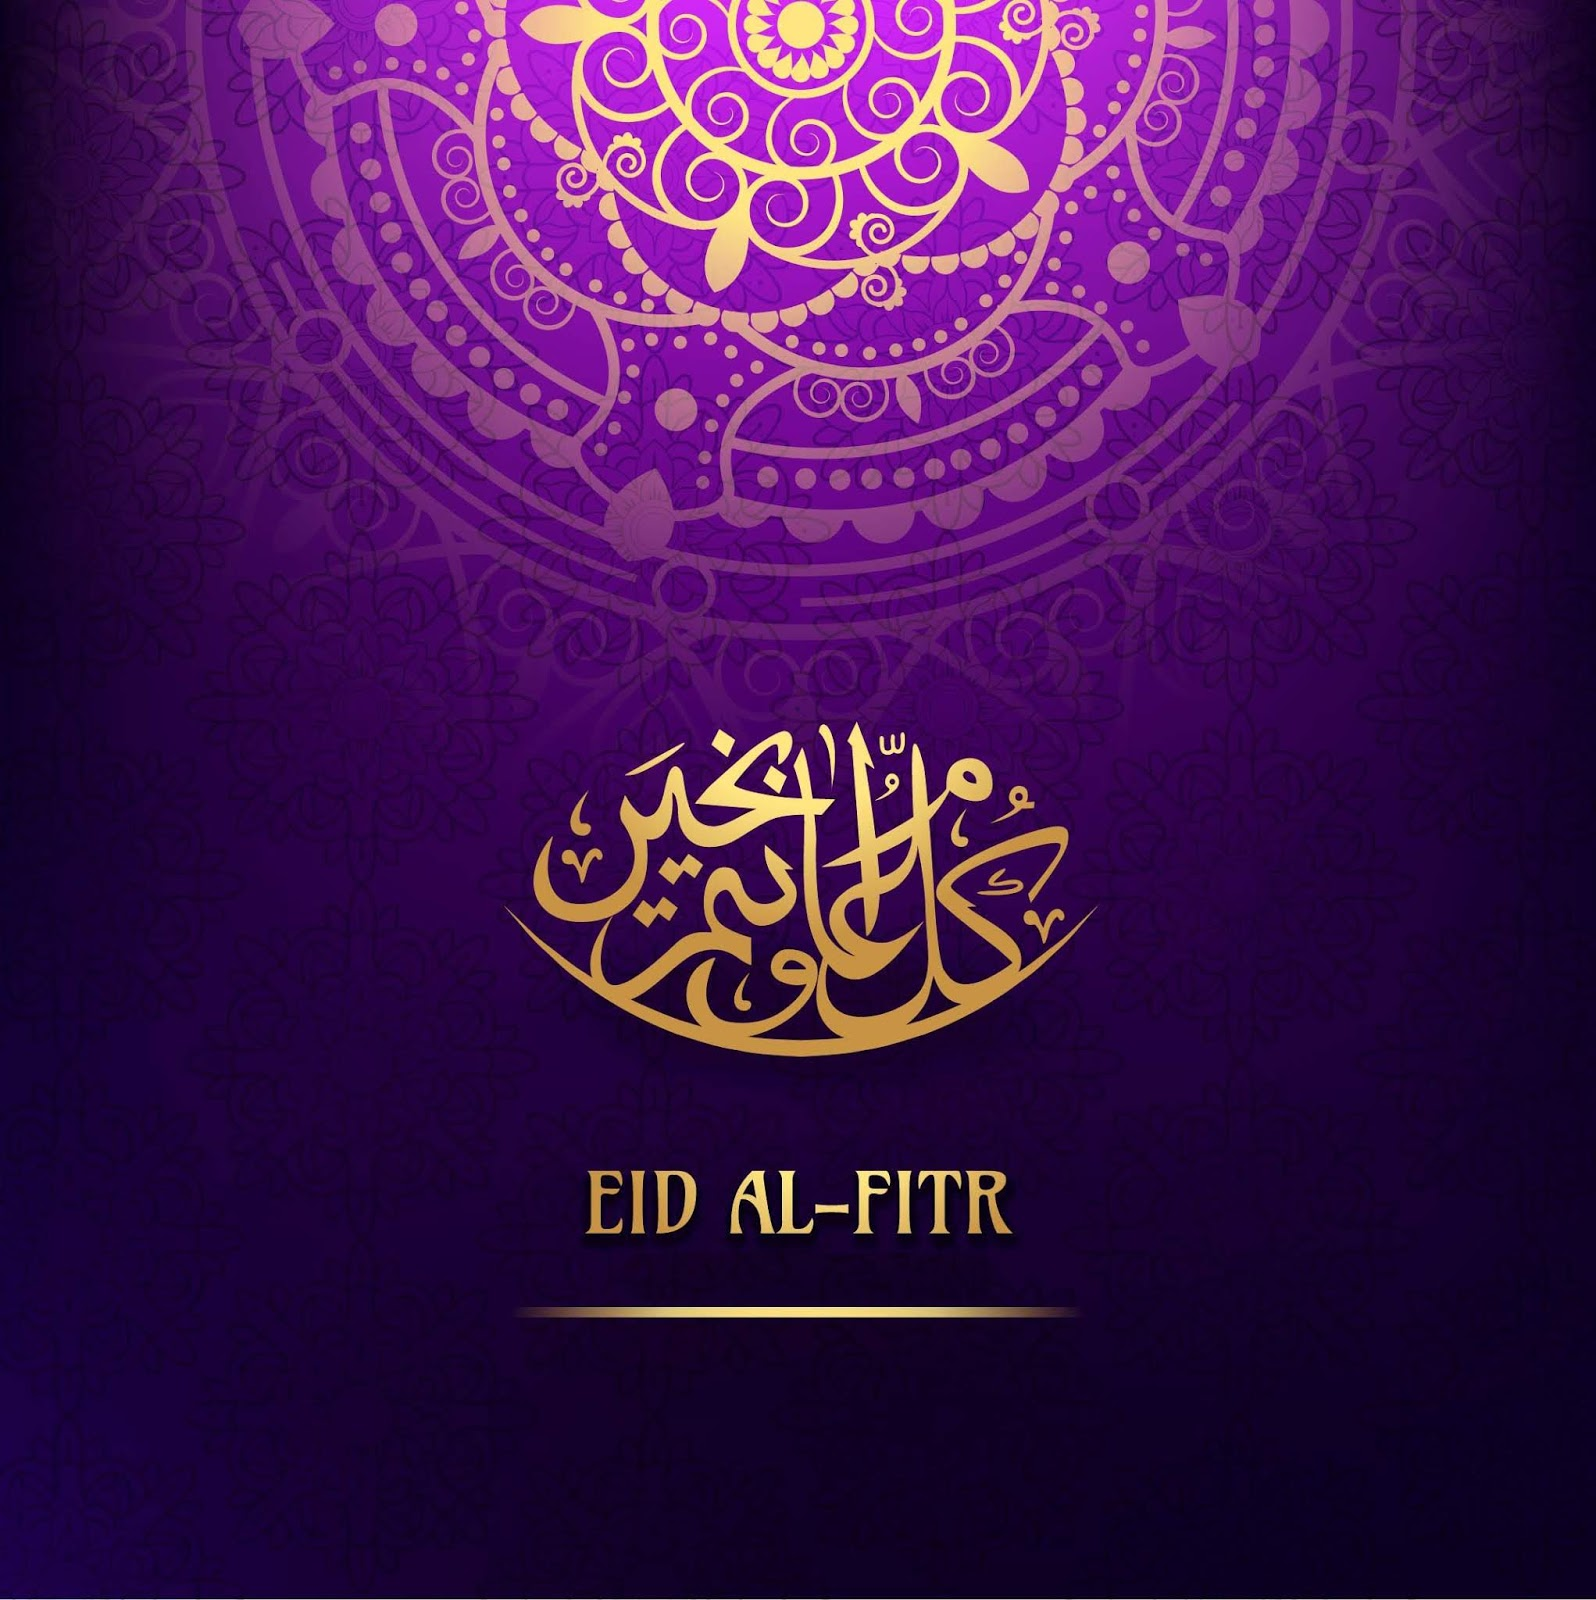 eid-mubarak-images-2019